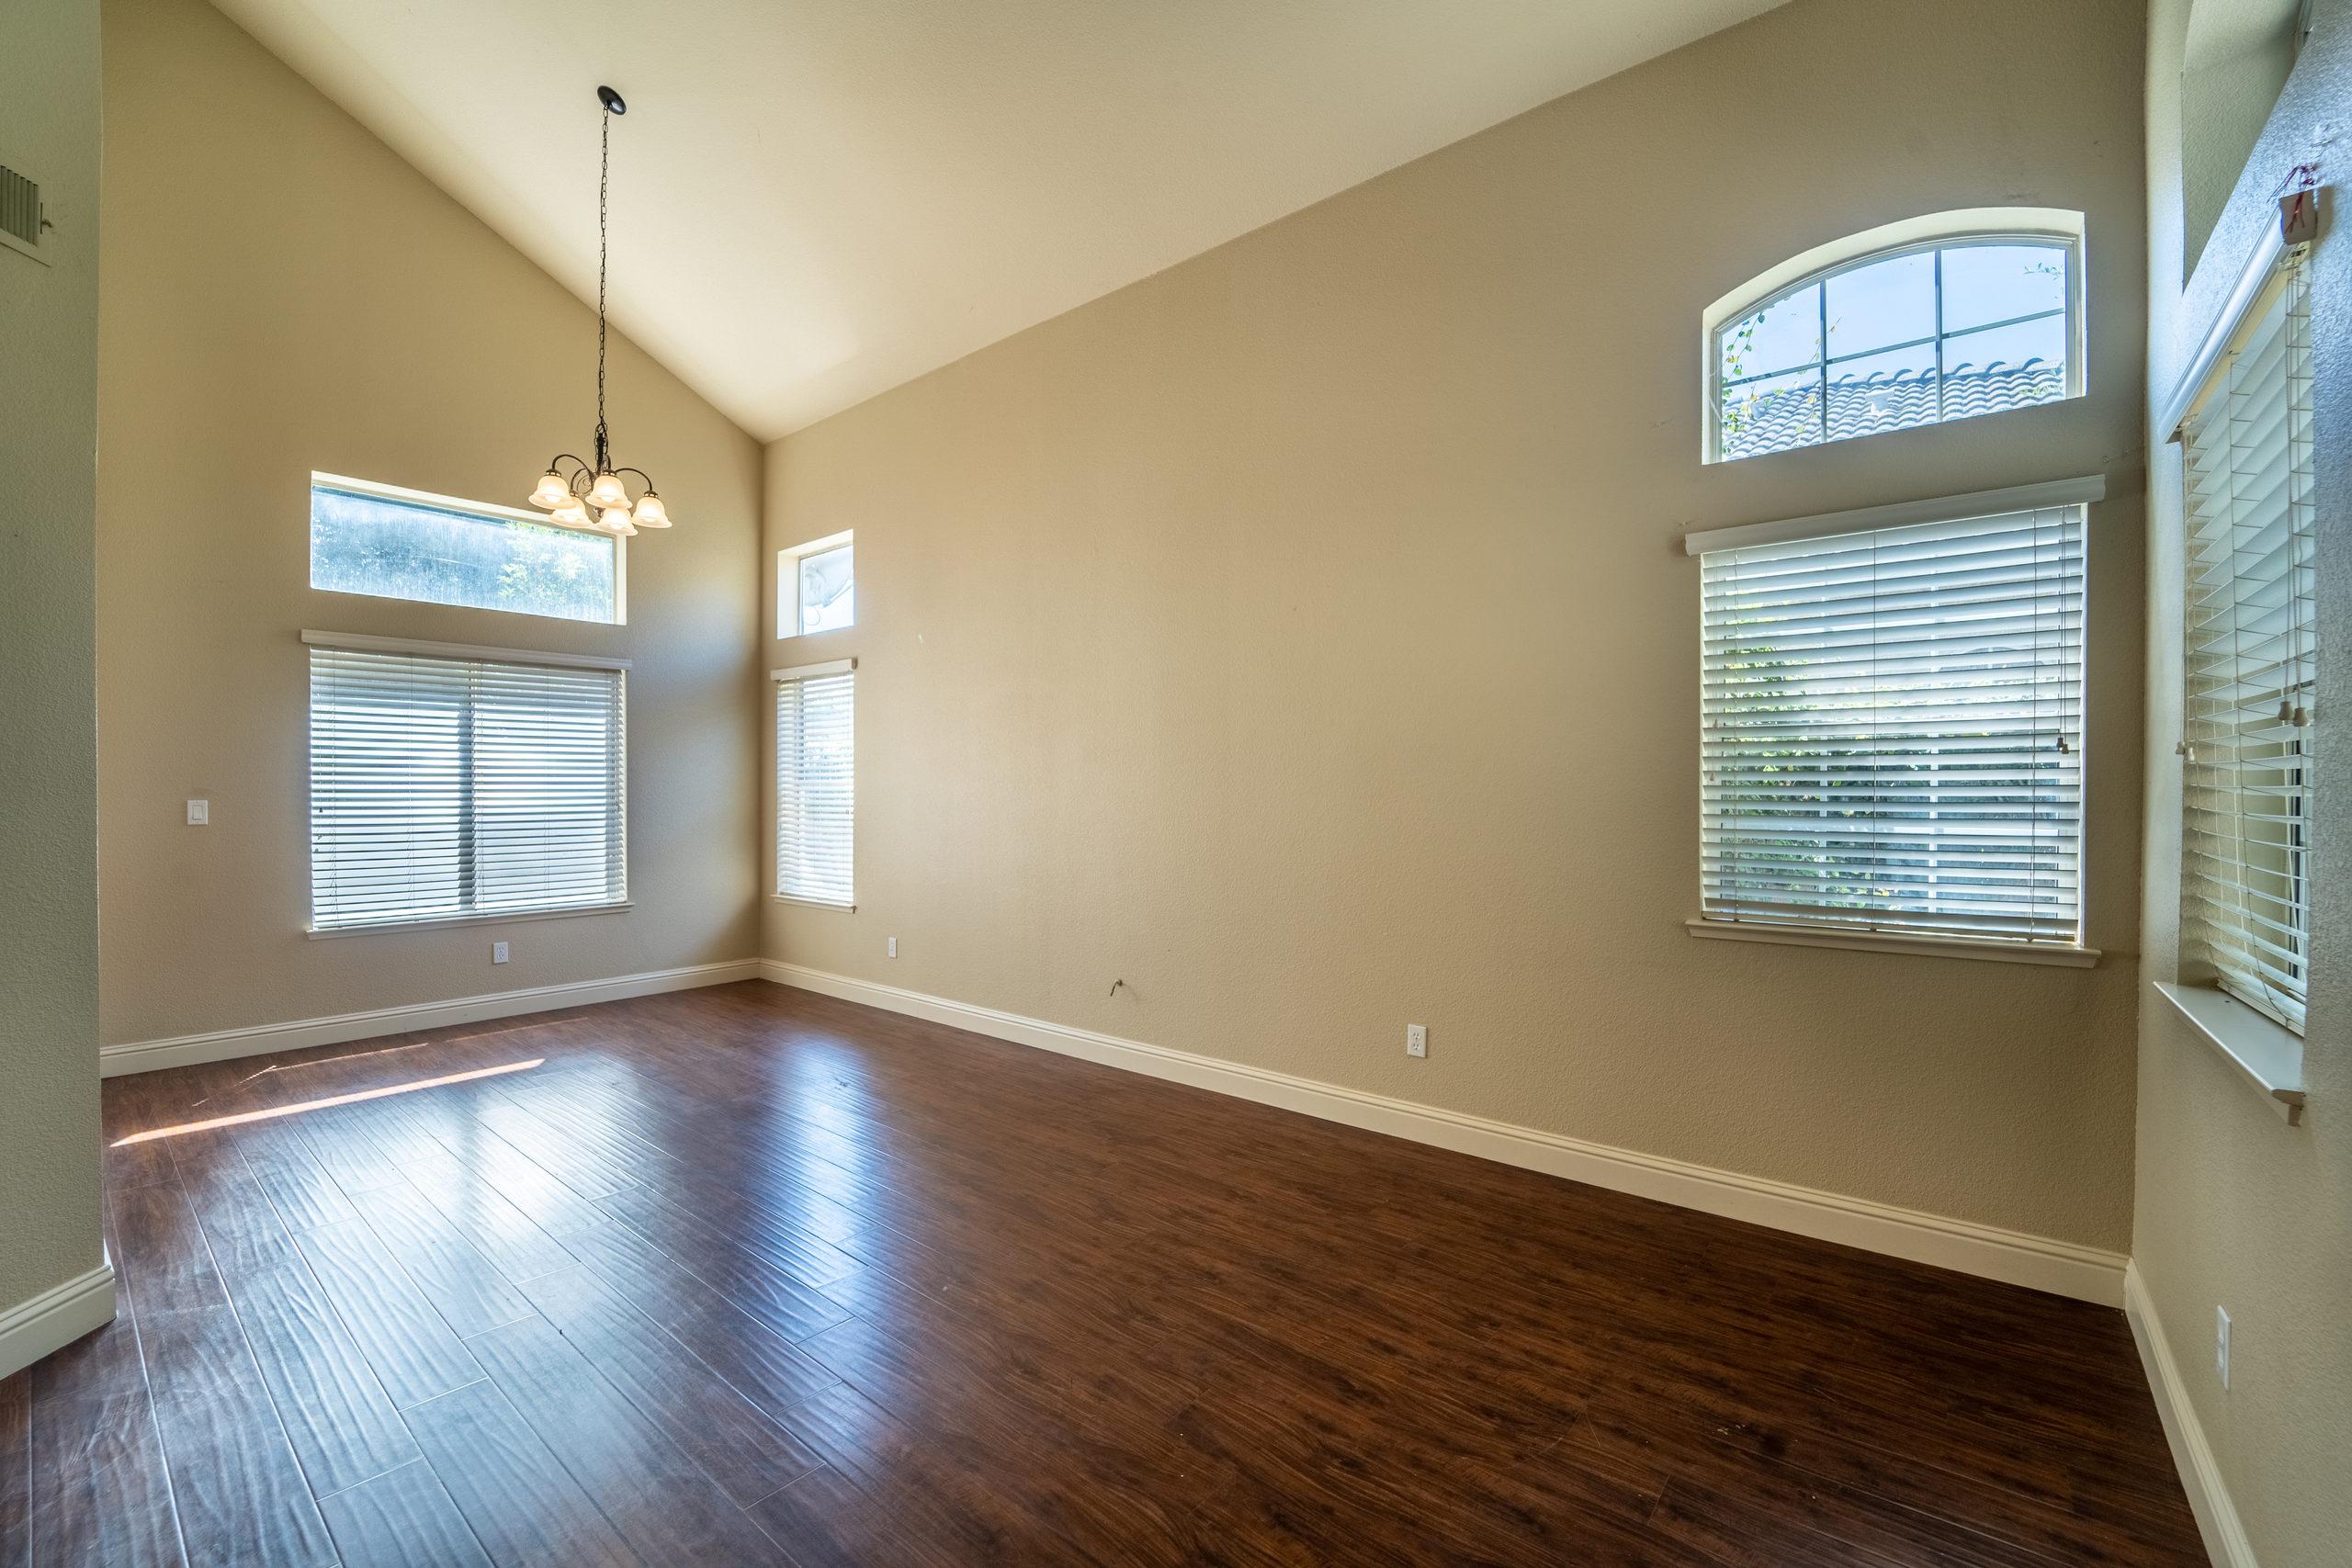 4060 N Olive Ave Turlock, CA 95382-0265